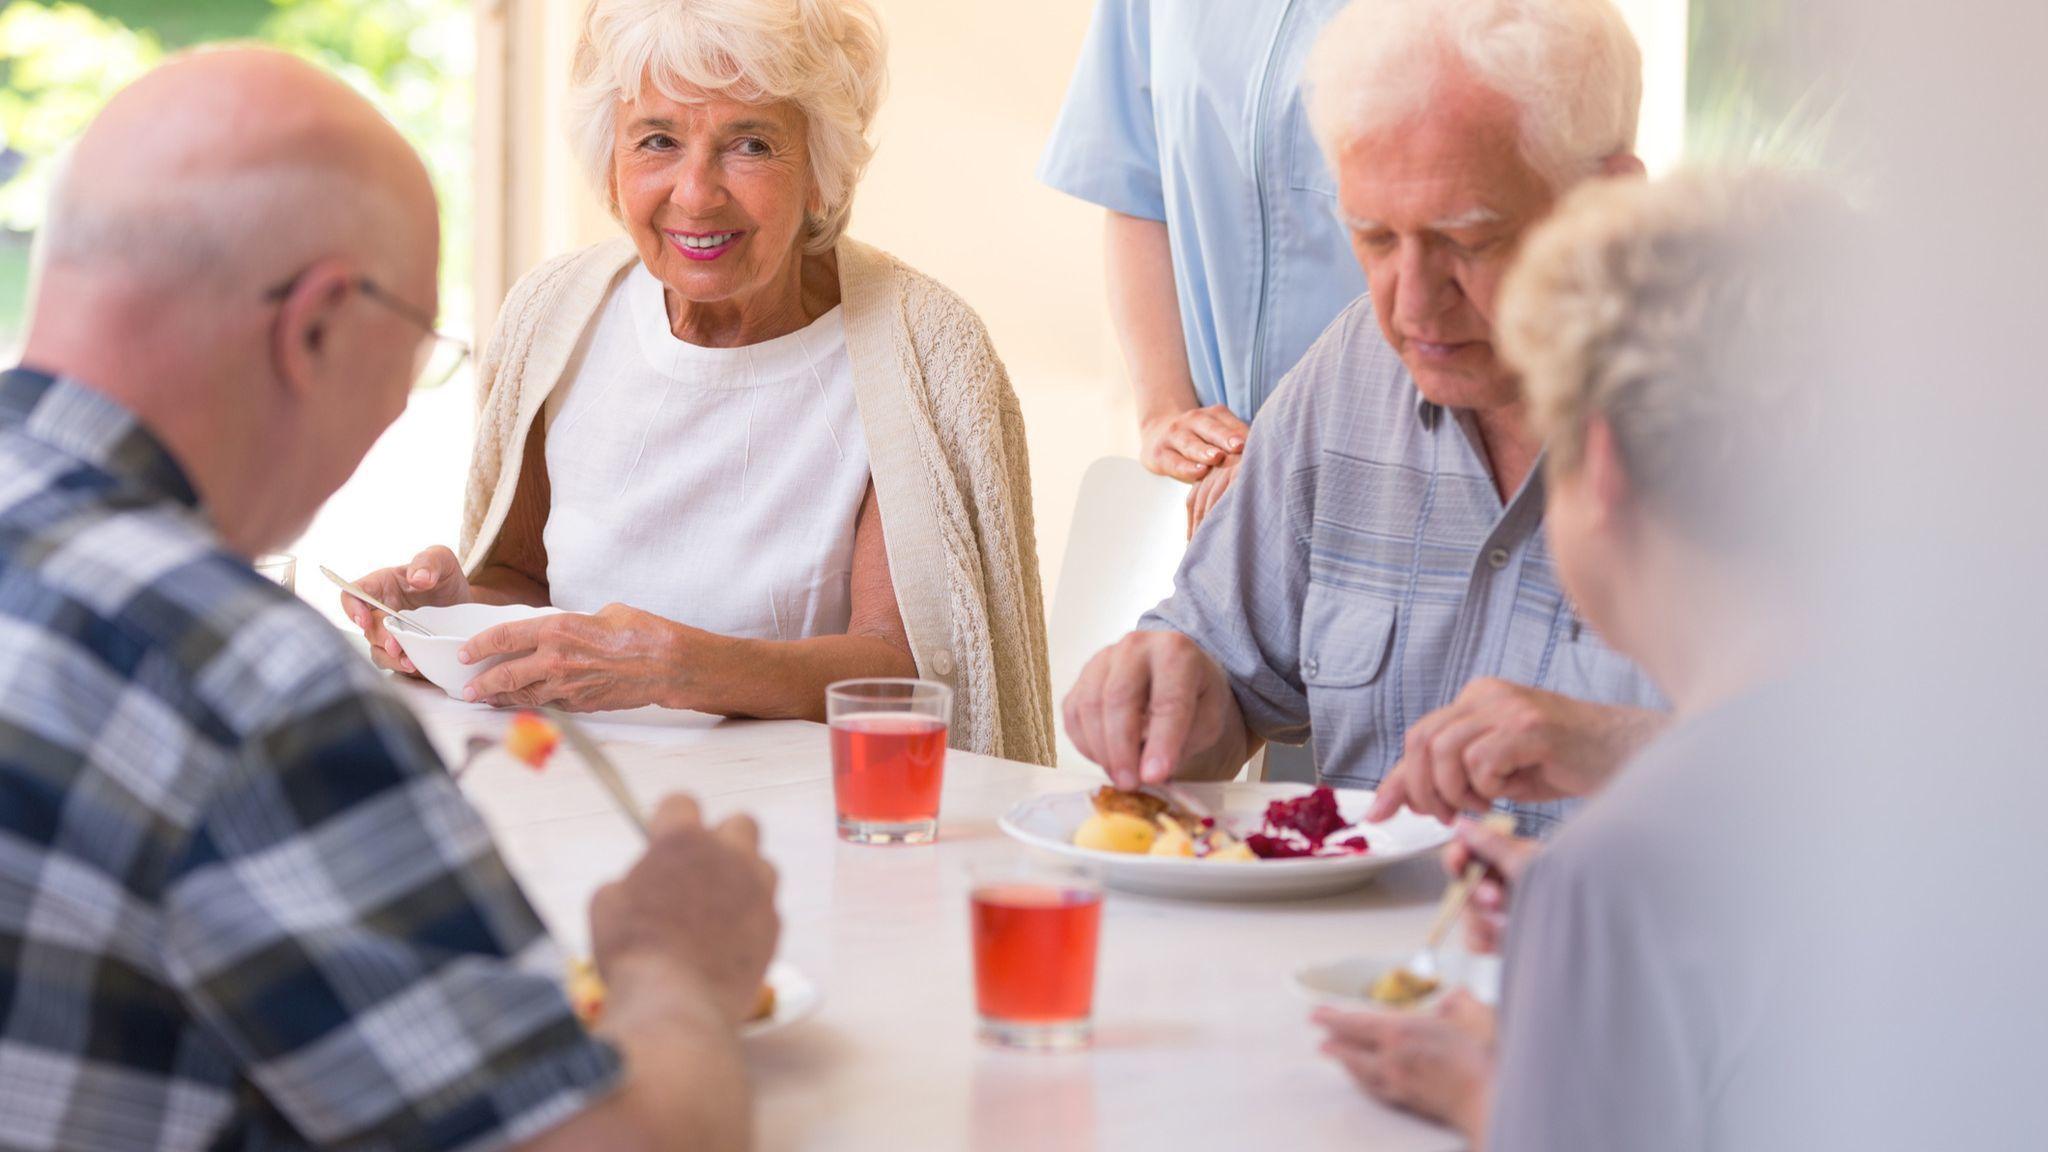 Paul's Place offers respite program for dementia caregivers